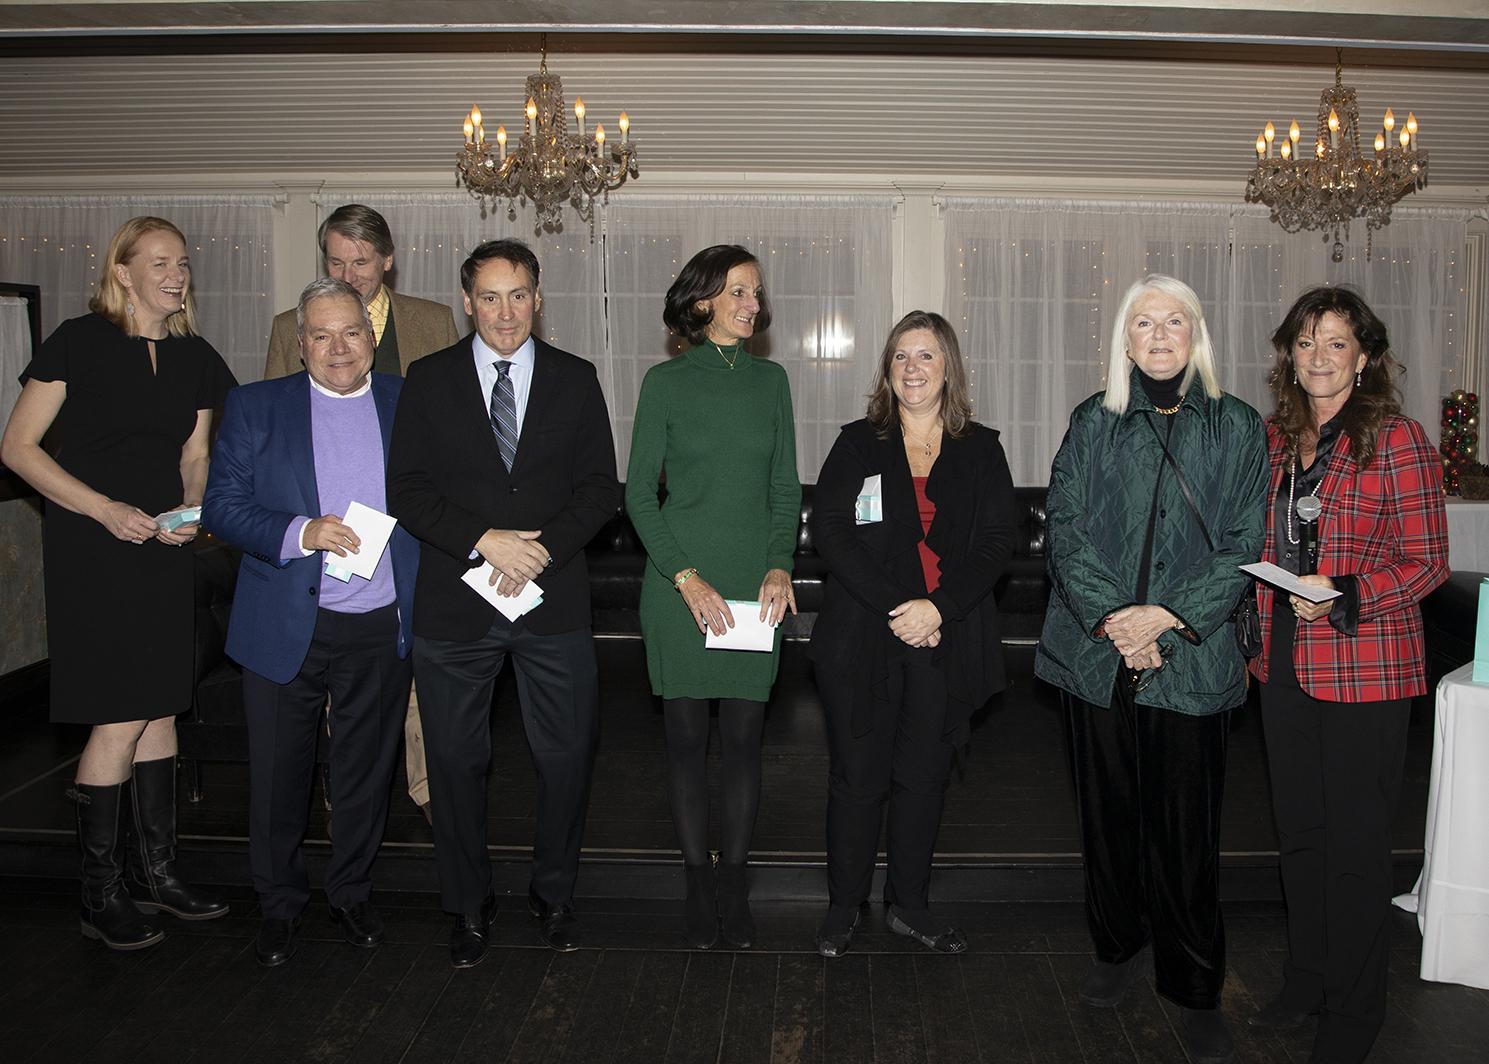 Evelina McDermott, Gene Stilwell, joan Bischoff, Patrick Galway, Laura Mott, Kimberley Terry, Nancy McGann,and Judi Desiderio